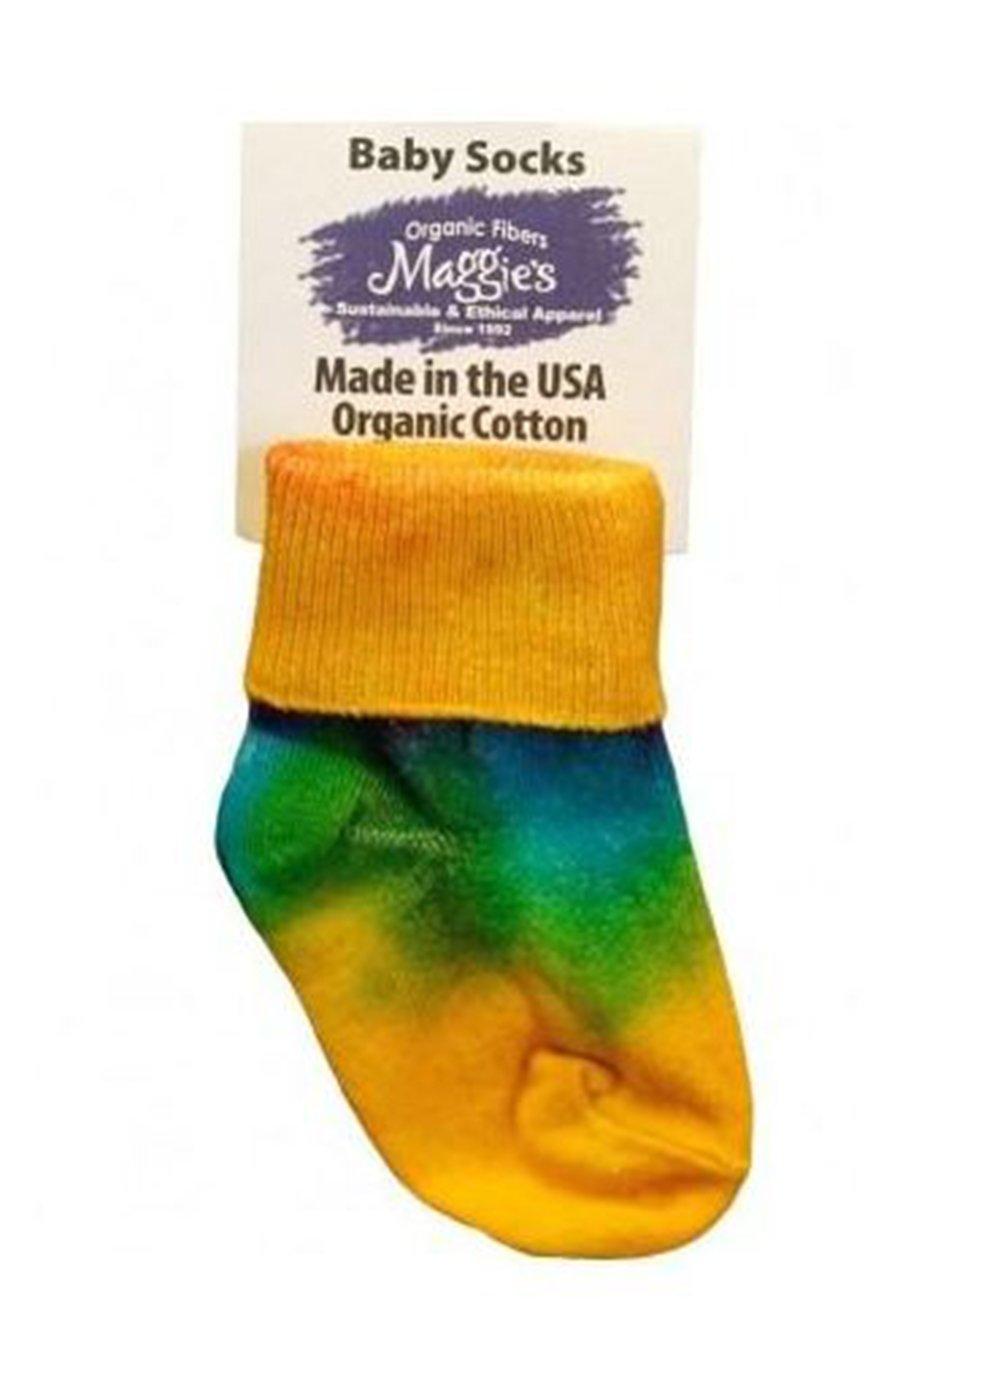 Maggie's Organics - Organic Cotton Tie Dye Baby Anklet Socks - Toddler - Tie Dye